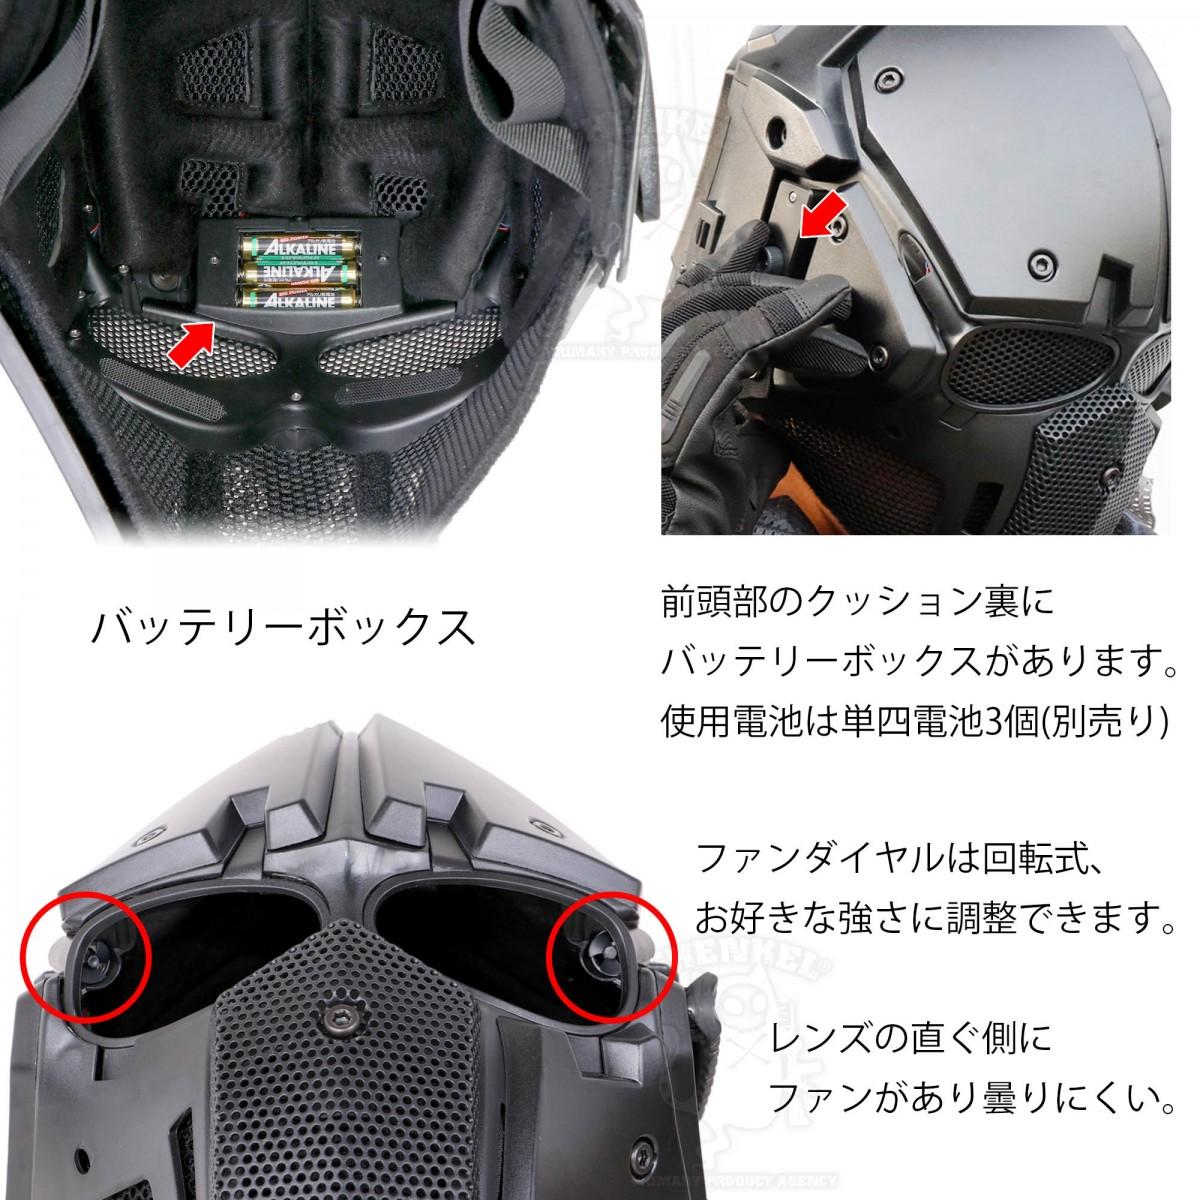 SHENKEL パーツを自由に交換できる NVGマウント モジュラーヘルメット ファン付 ブラック ルフェイスマスク Obsidian